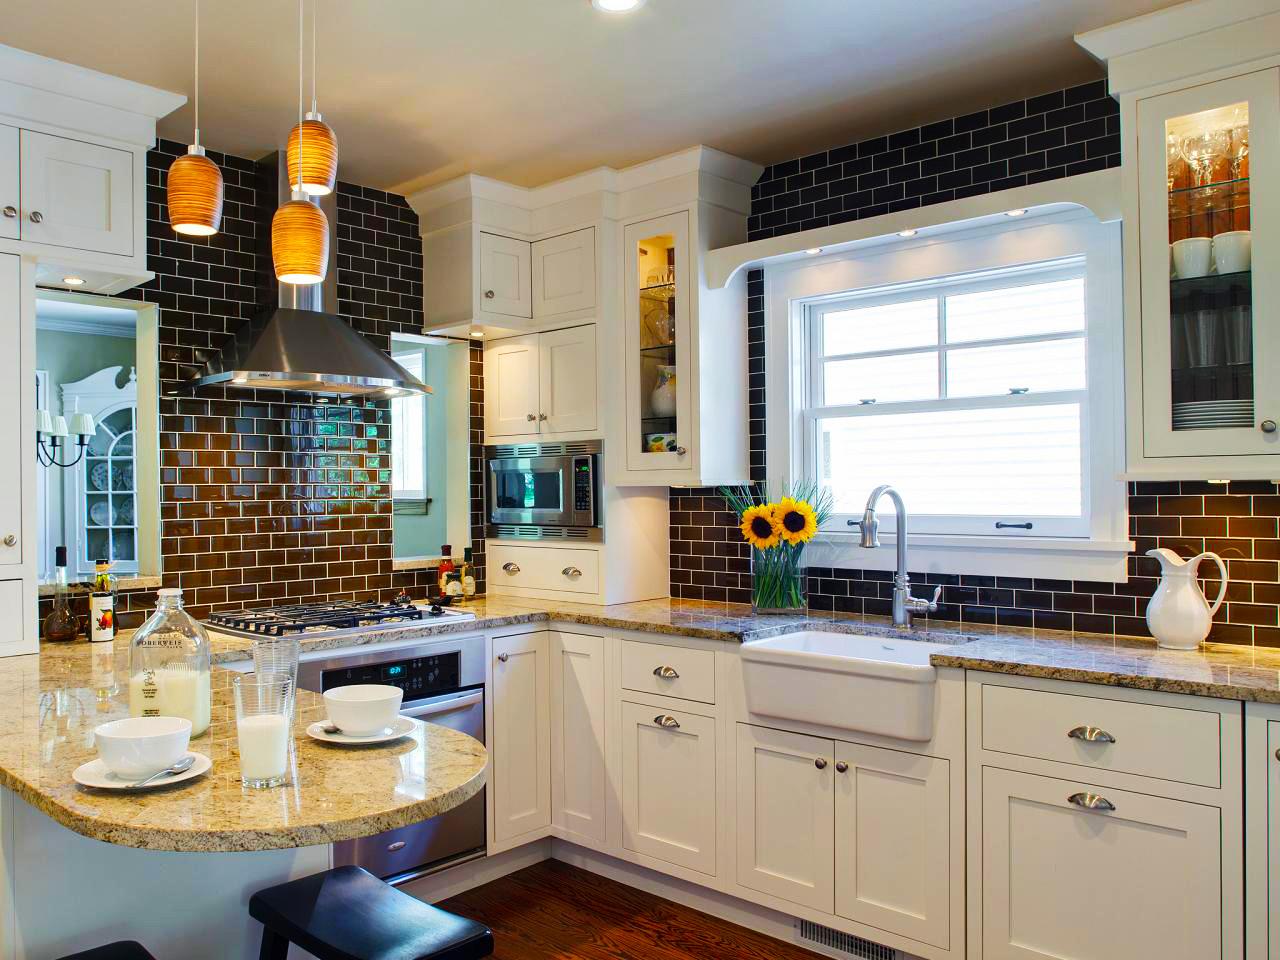 Cost Of Kitchen Backsplash  Cost to Remodel Kitchen Backsplash Designs